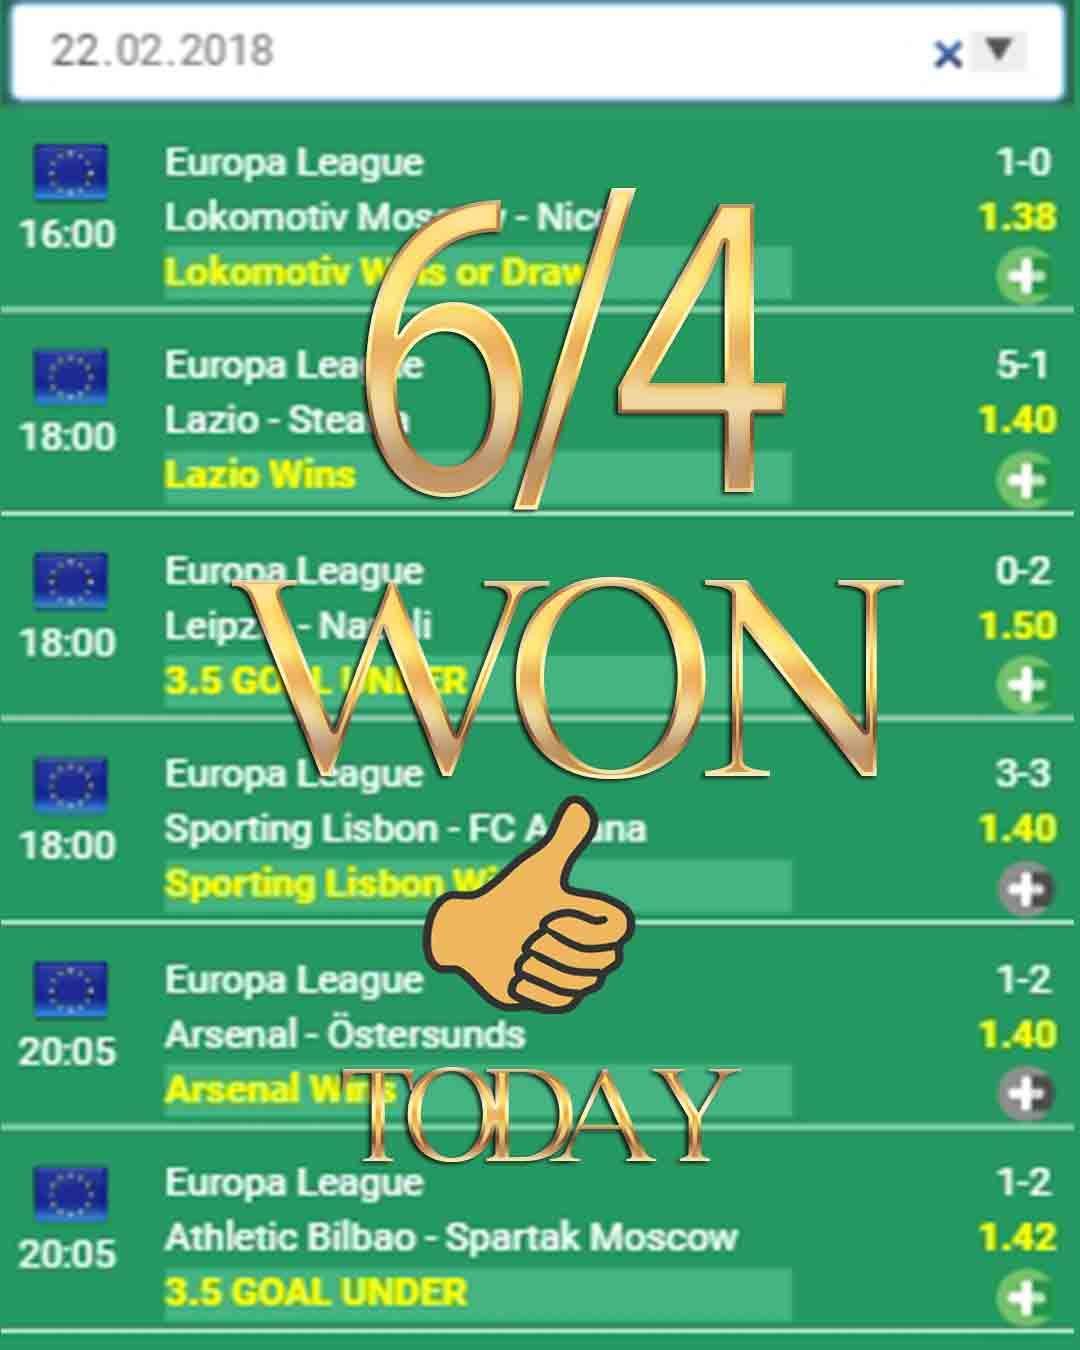 Www bet 365 prediction